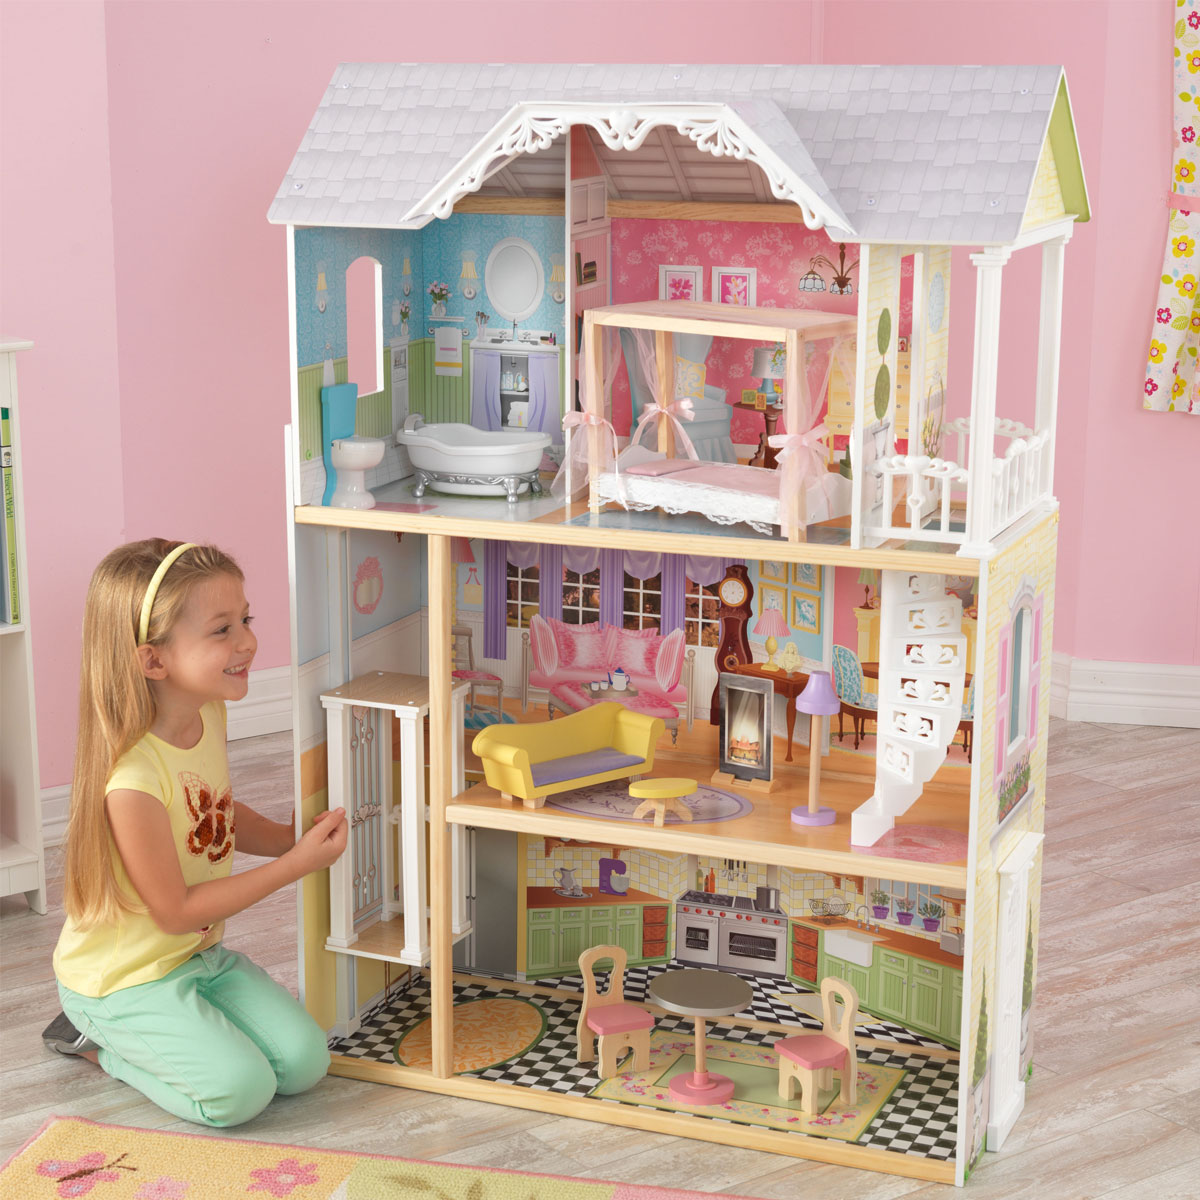 kidkraft puppenhaus kaylee 65251 pirum. Black Bedroom Furniture Sets. Home Design Ideas